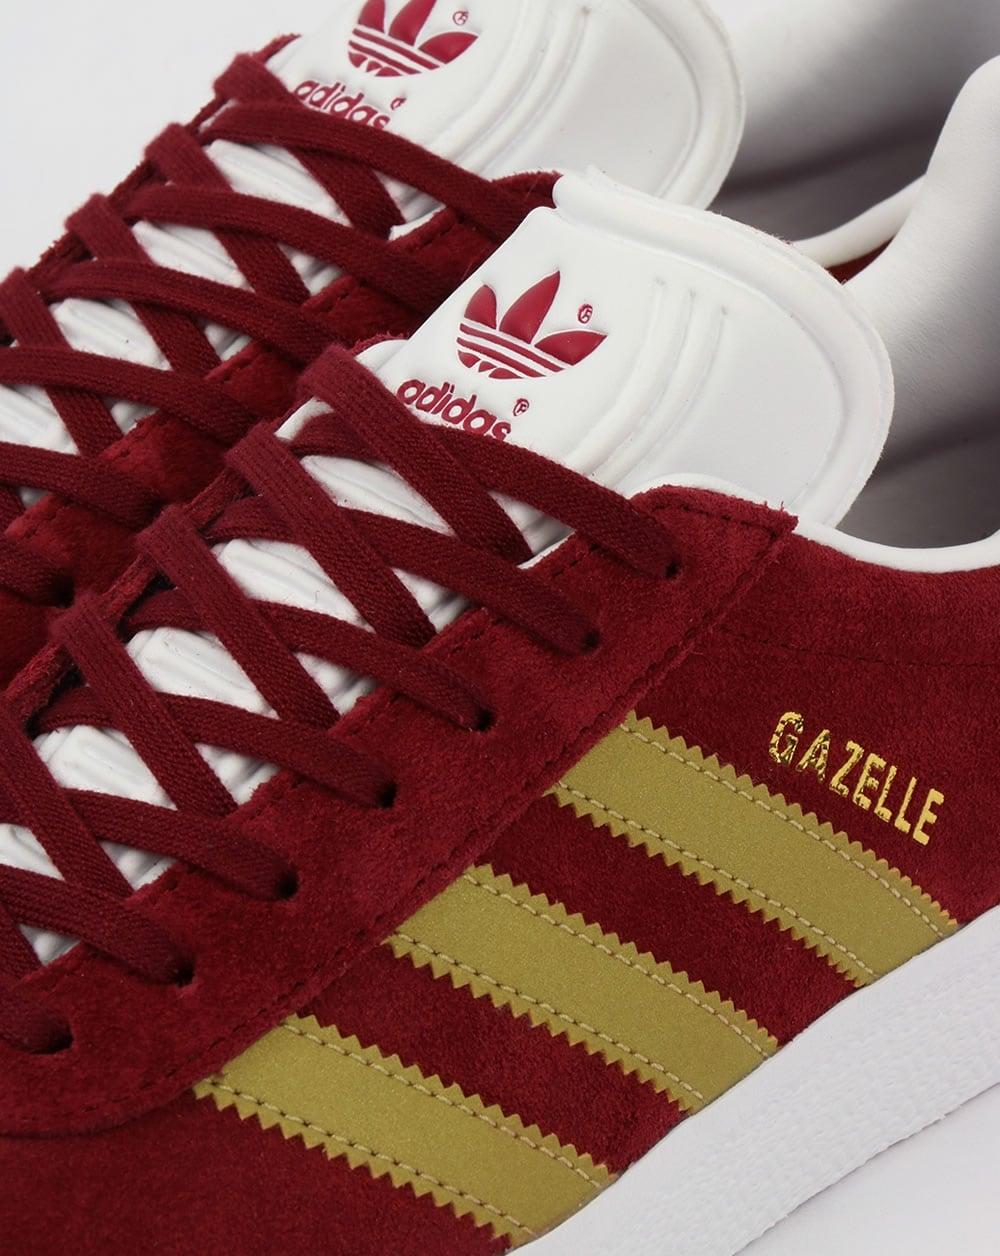 Adidas Gazelle Trainers Burgundy/Gold,originals,shoes,mens ... Caterpillar Shoes